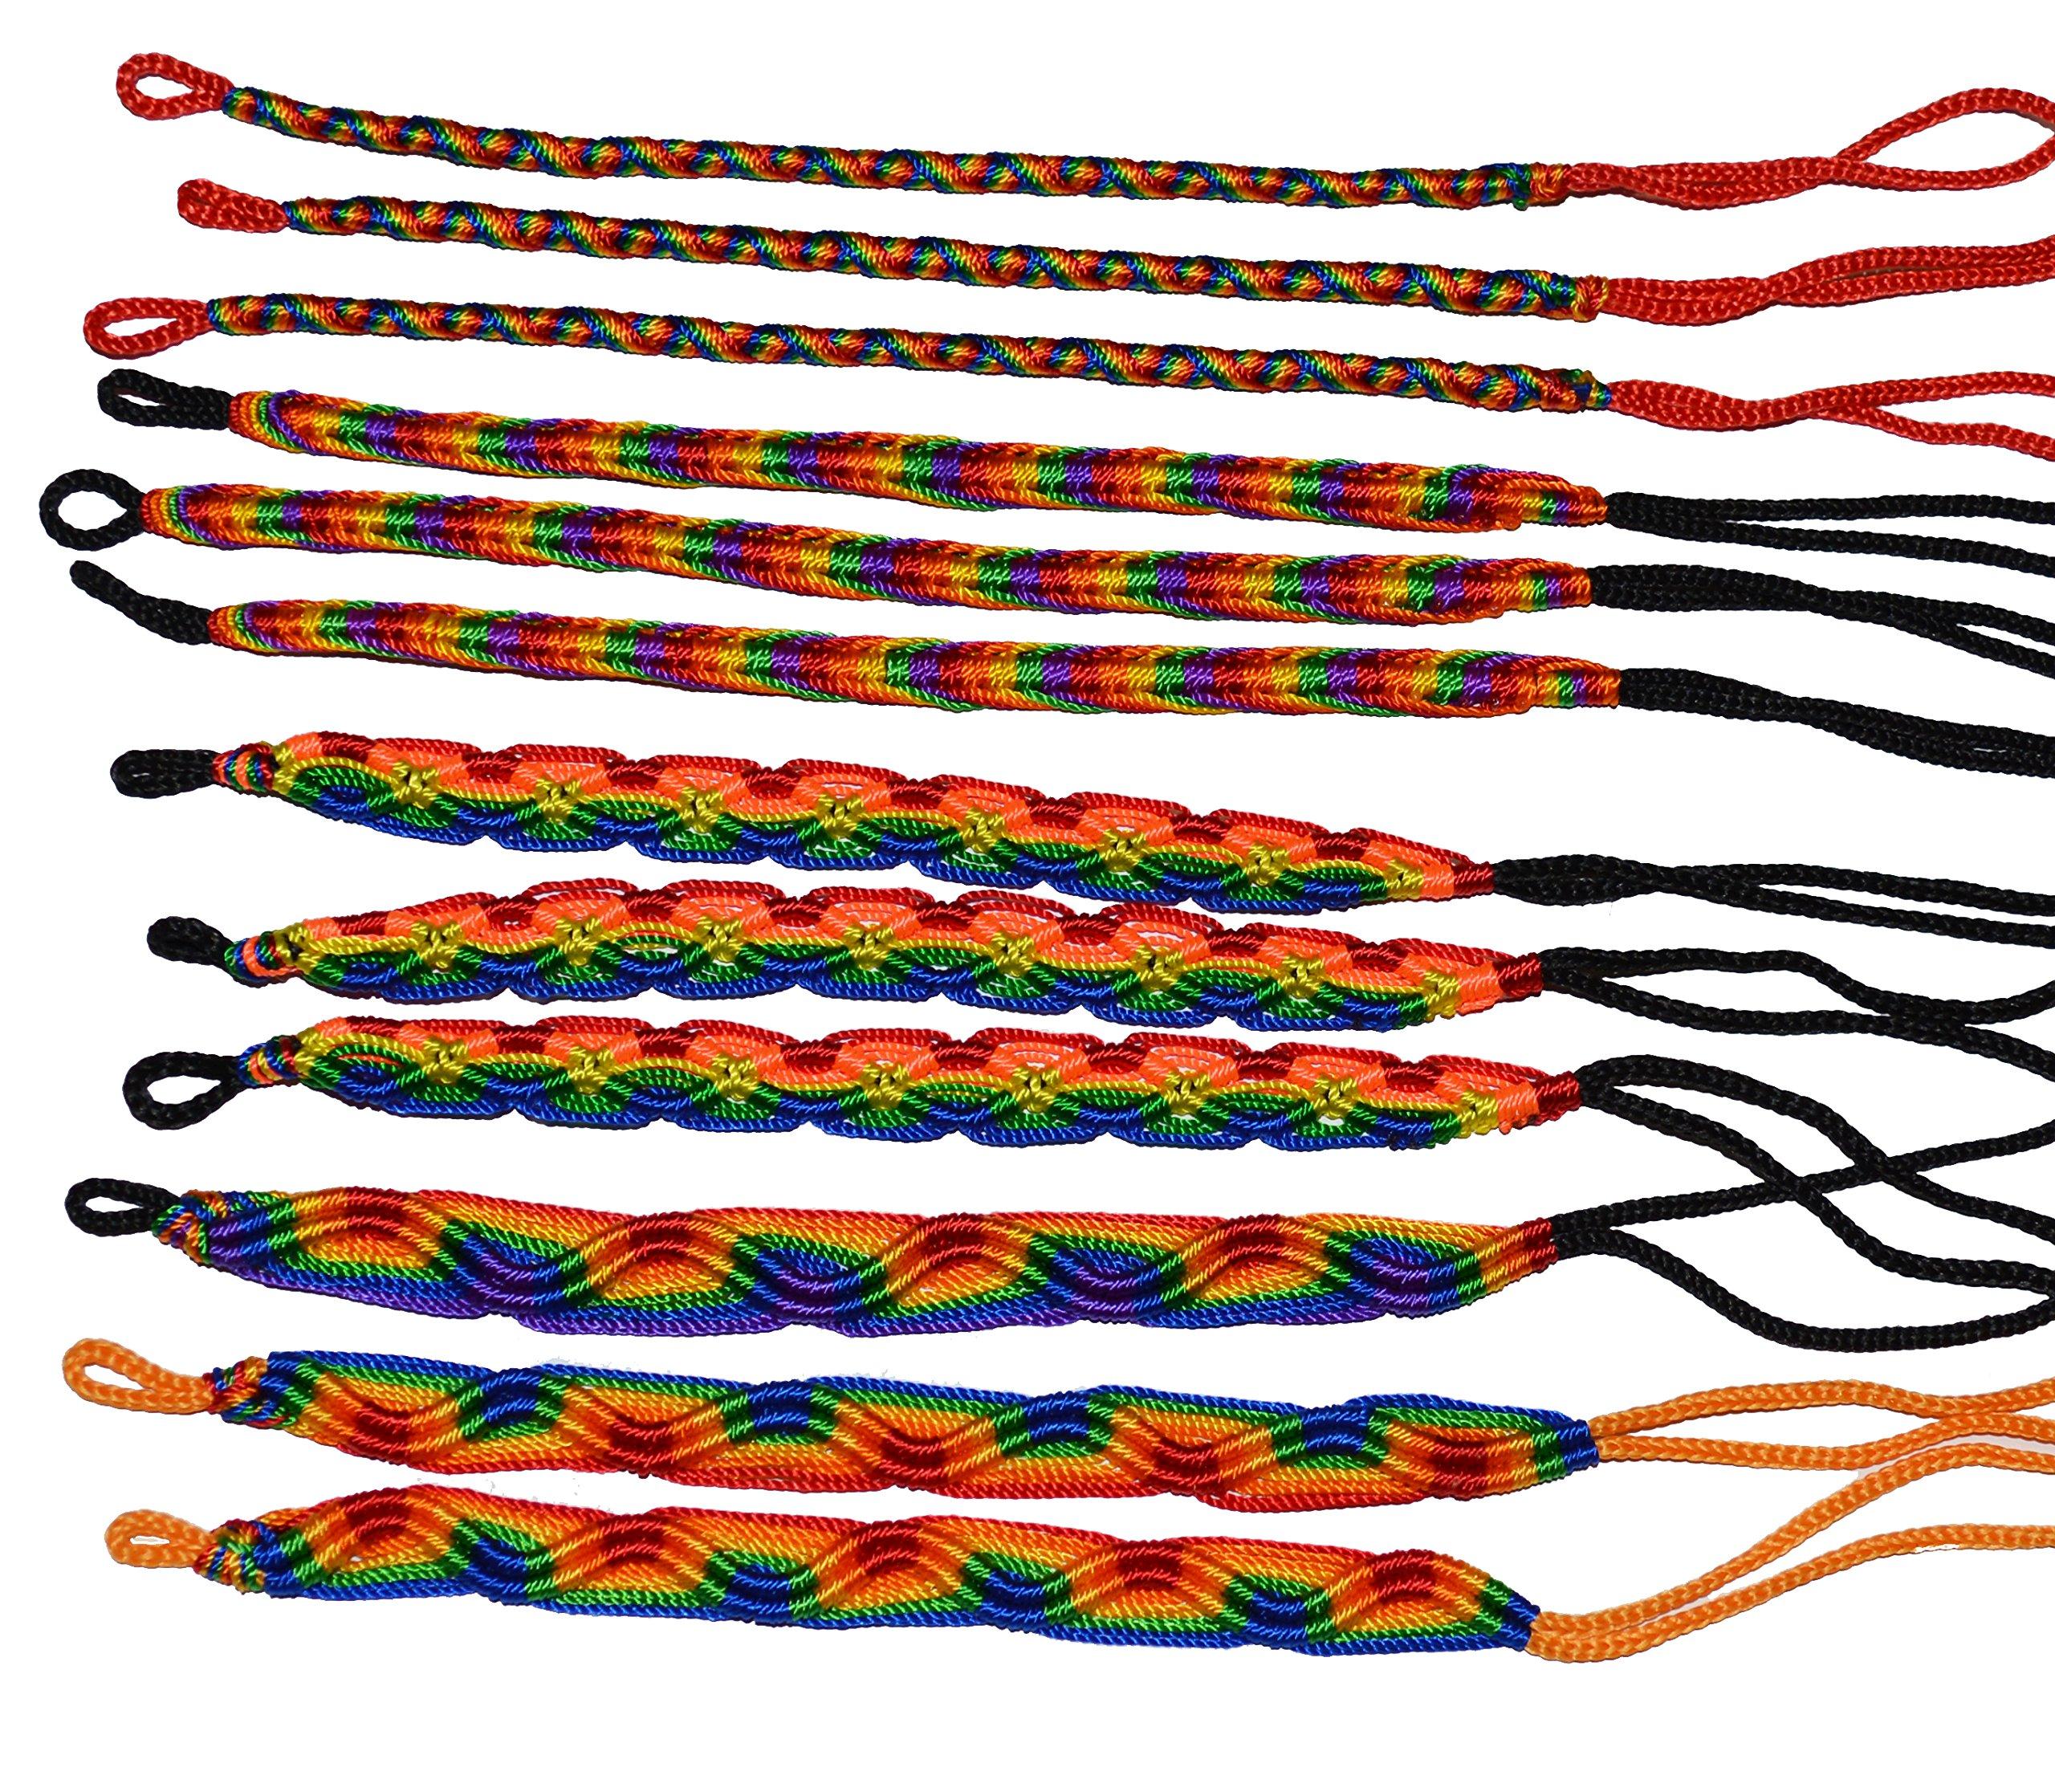 Rainbow Friendship Bracelets LOT 100 MIX From Peru Wholesale GAY Lesbian Pride by Handmade In Peru (Image #1)